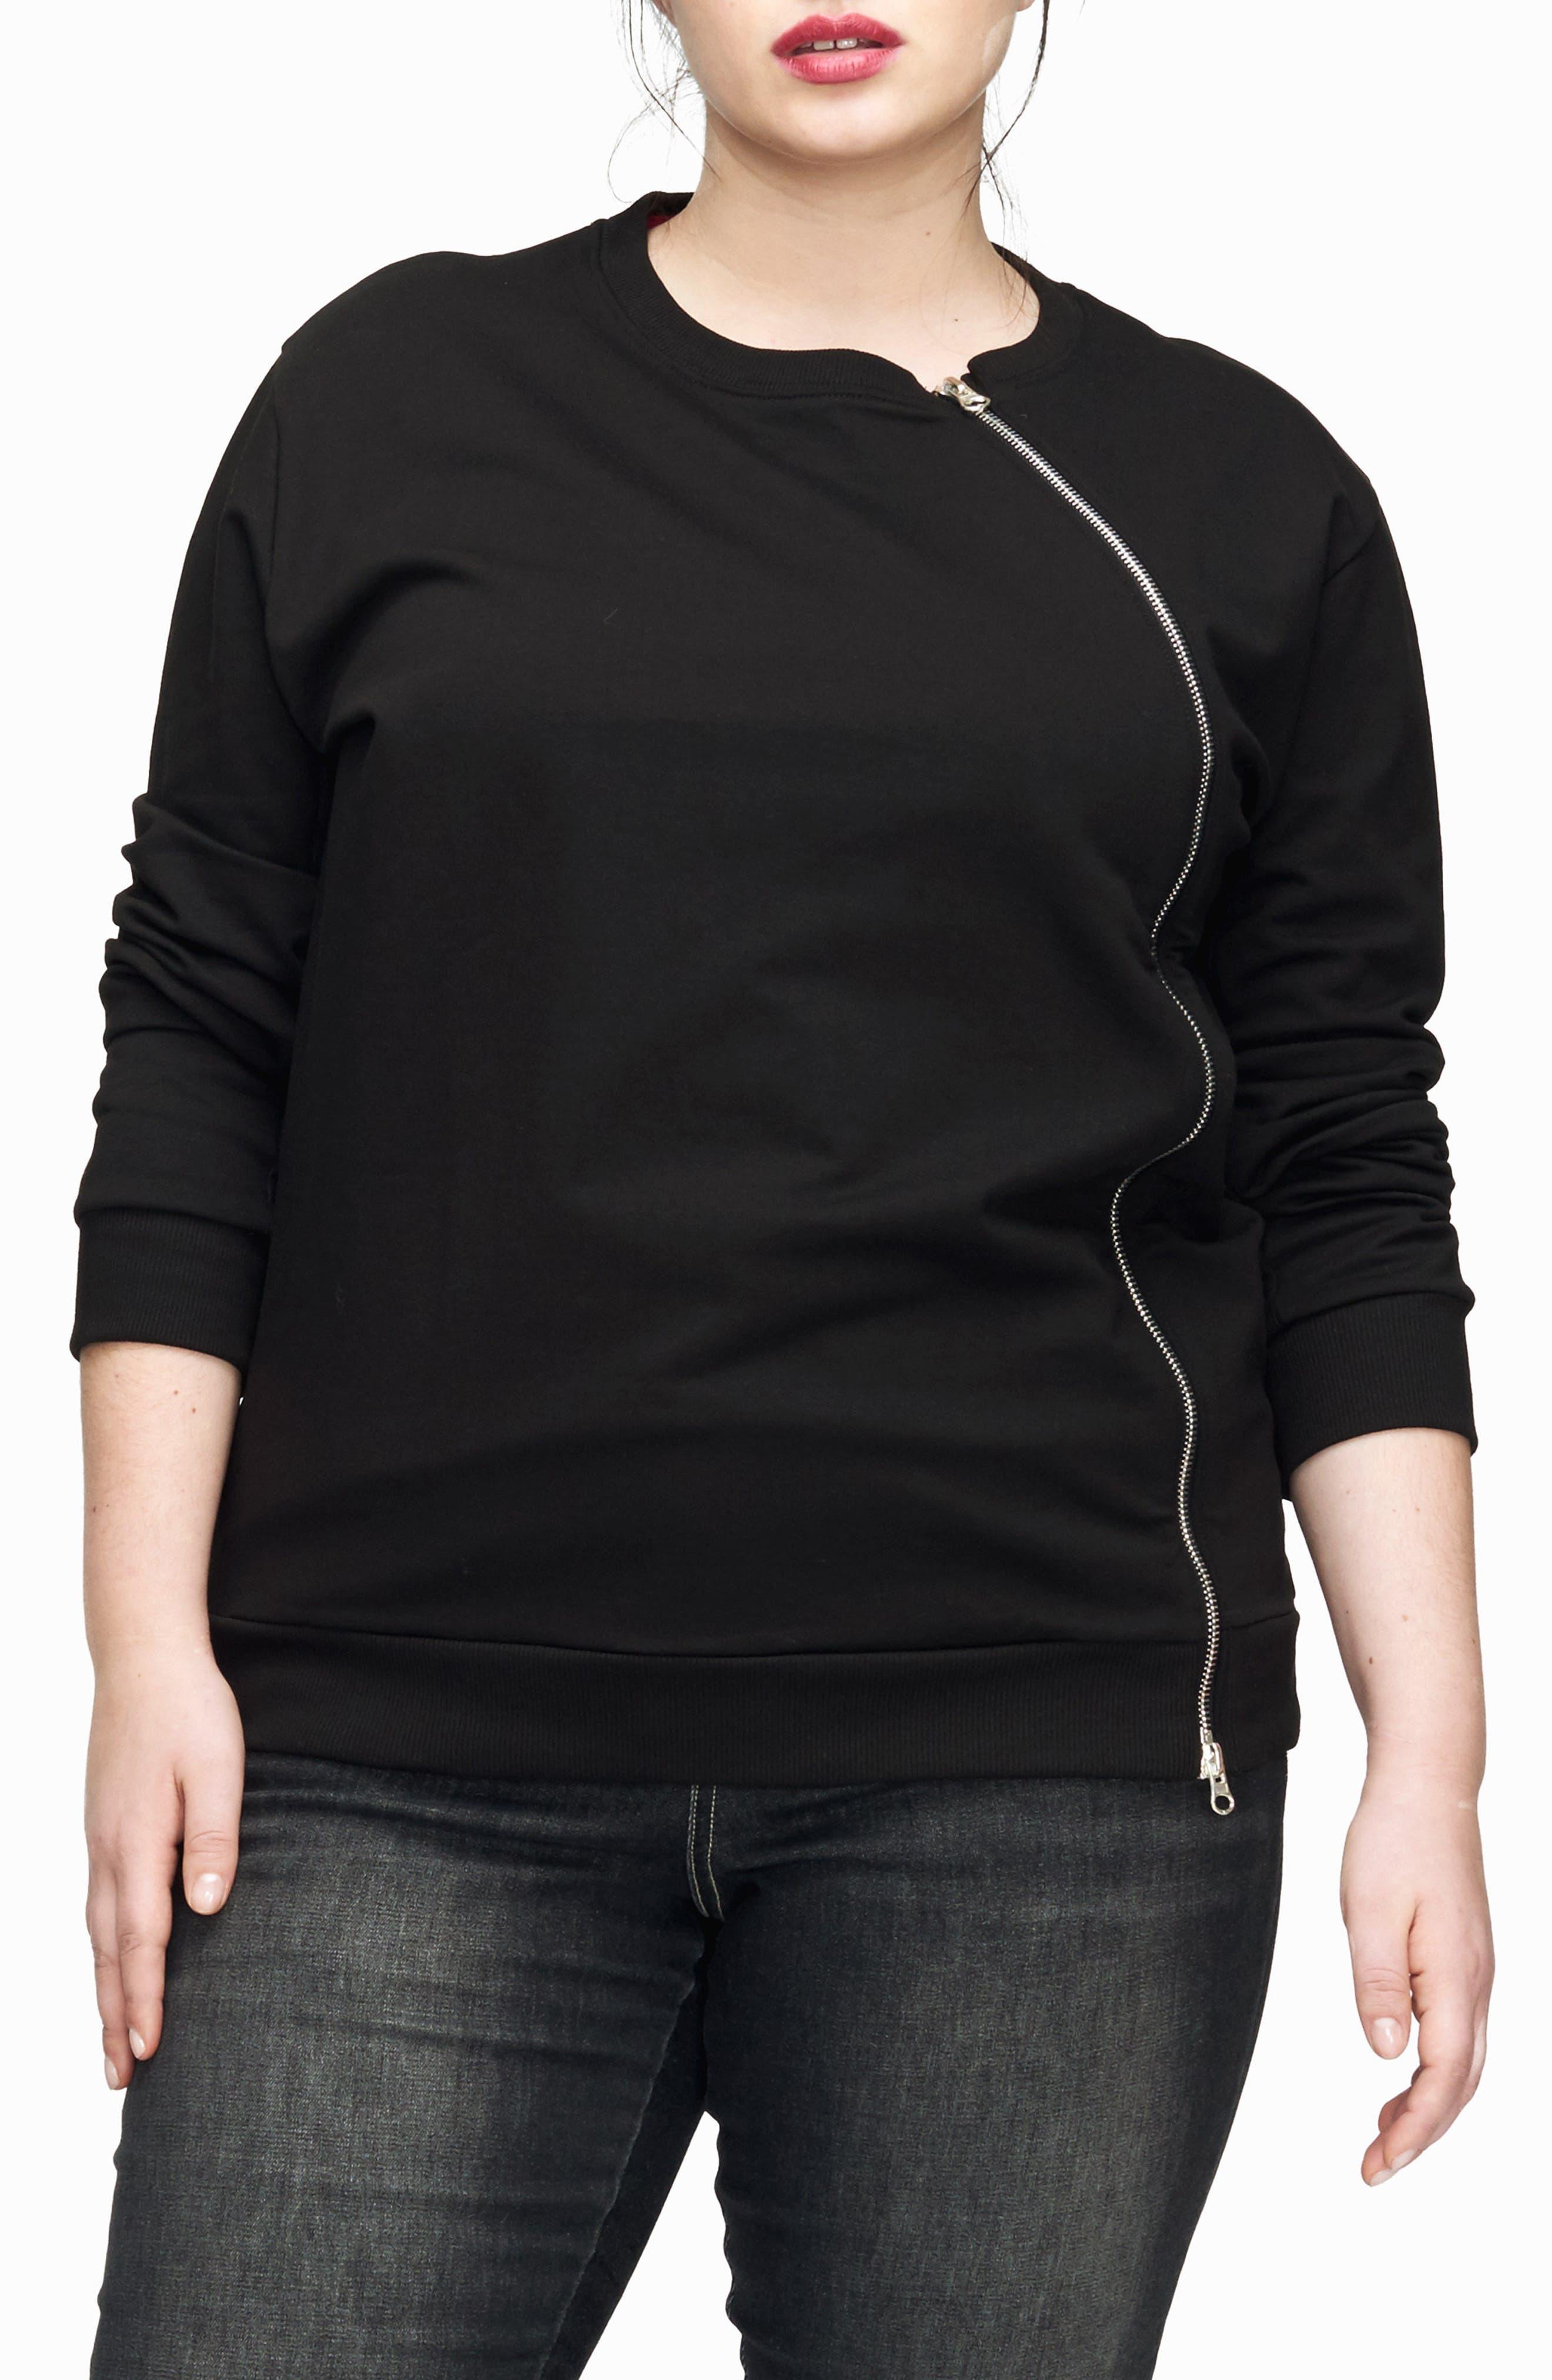 Meridian Zip Front Sweatshirt,                             Main thumbnail 1, color,                             Black